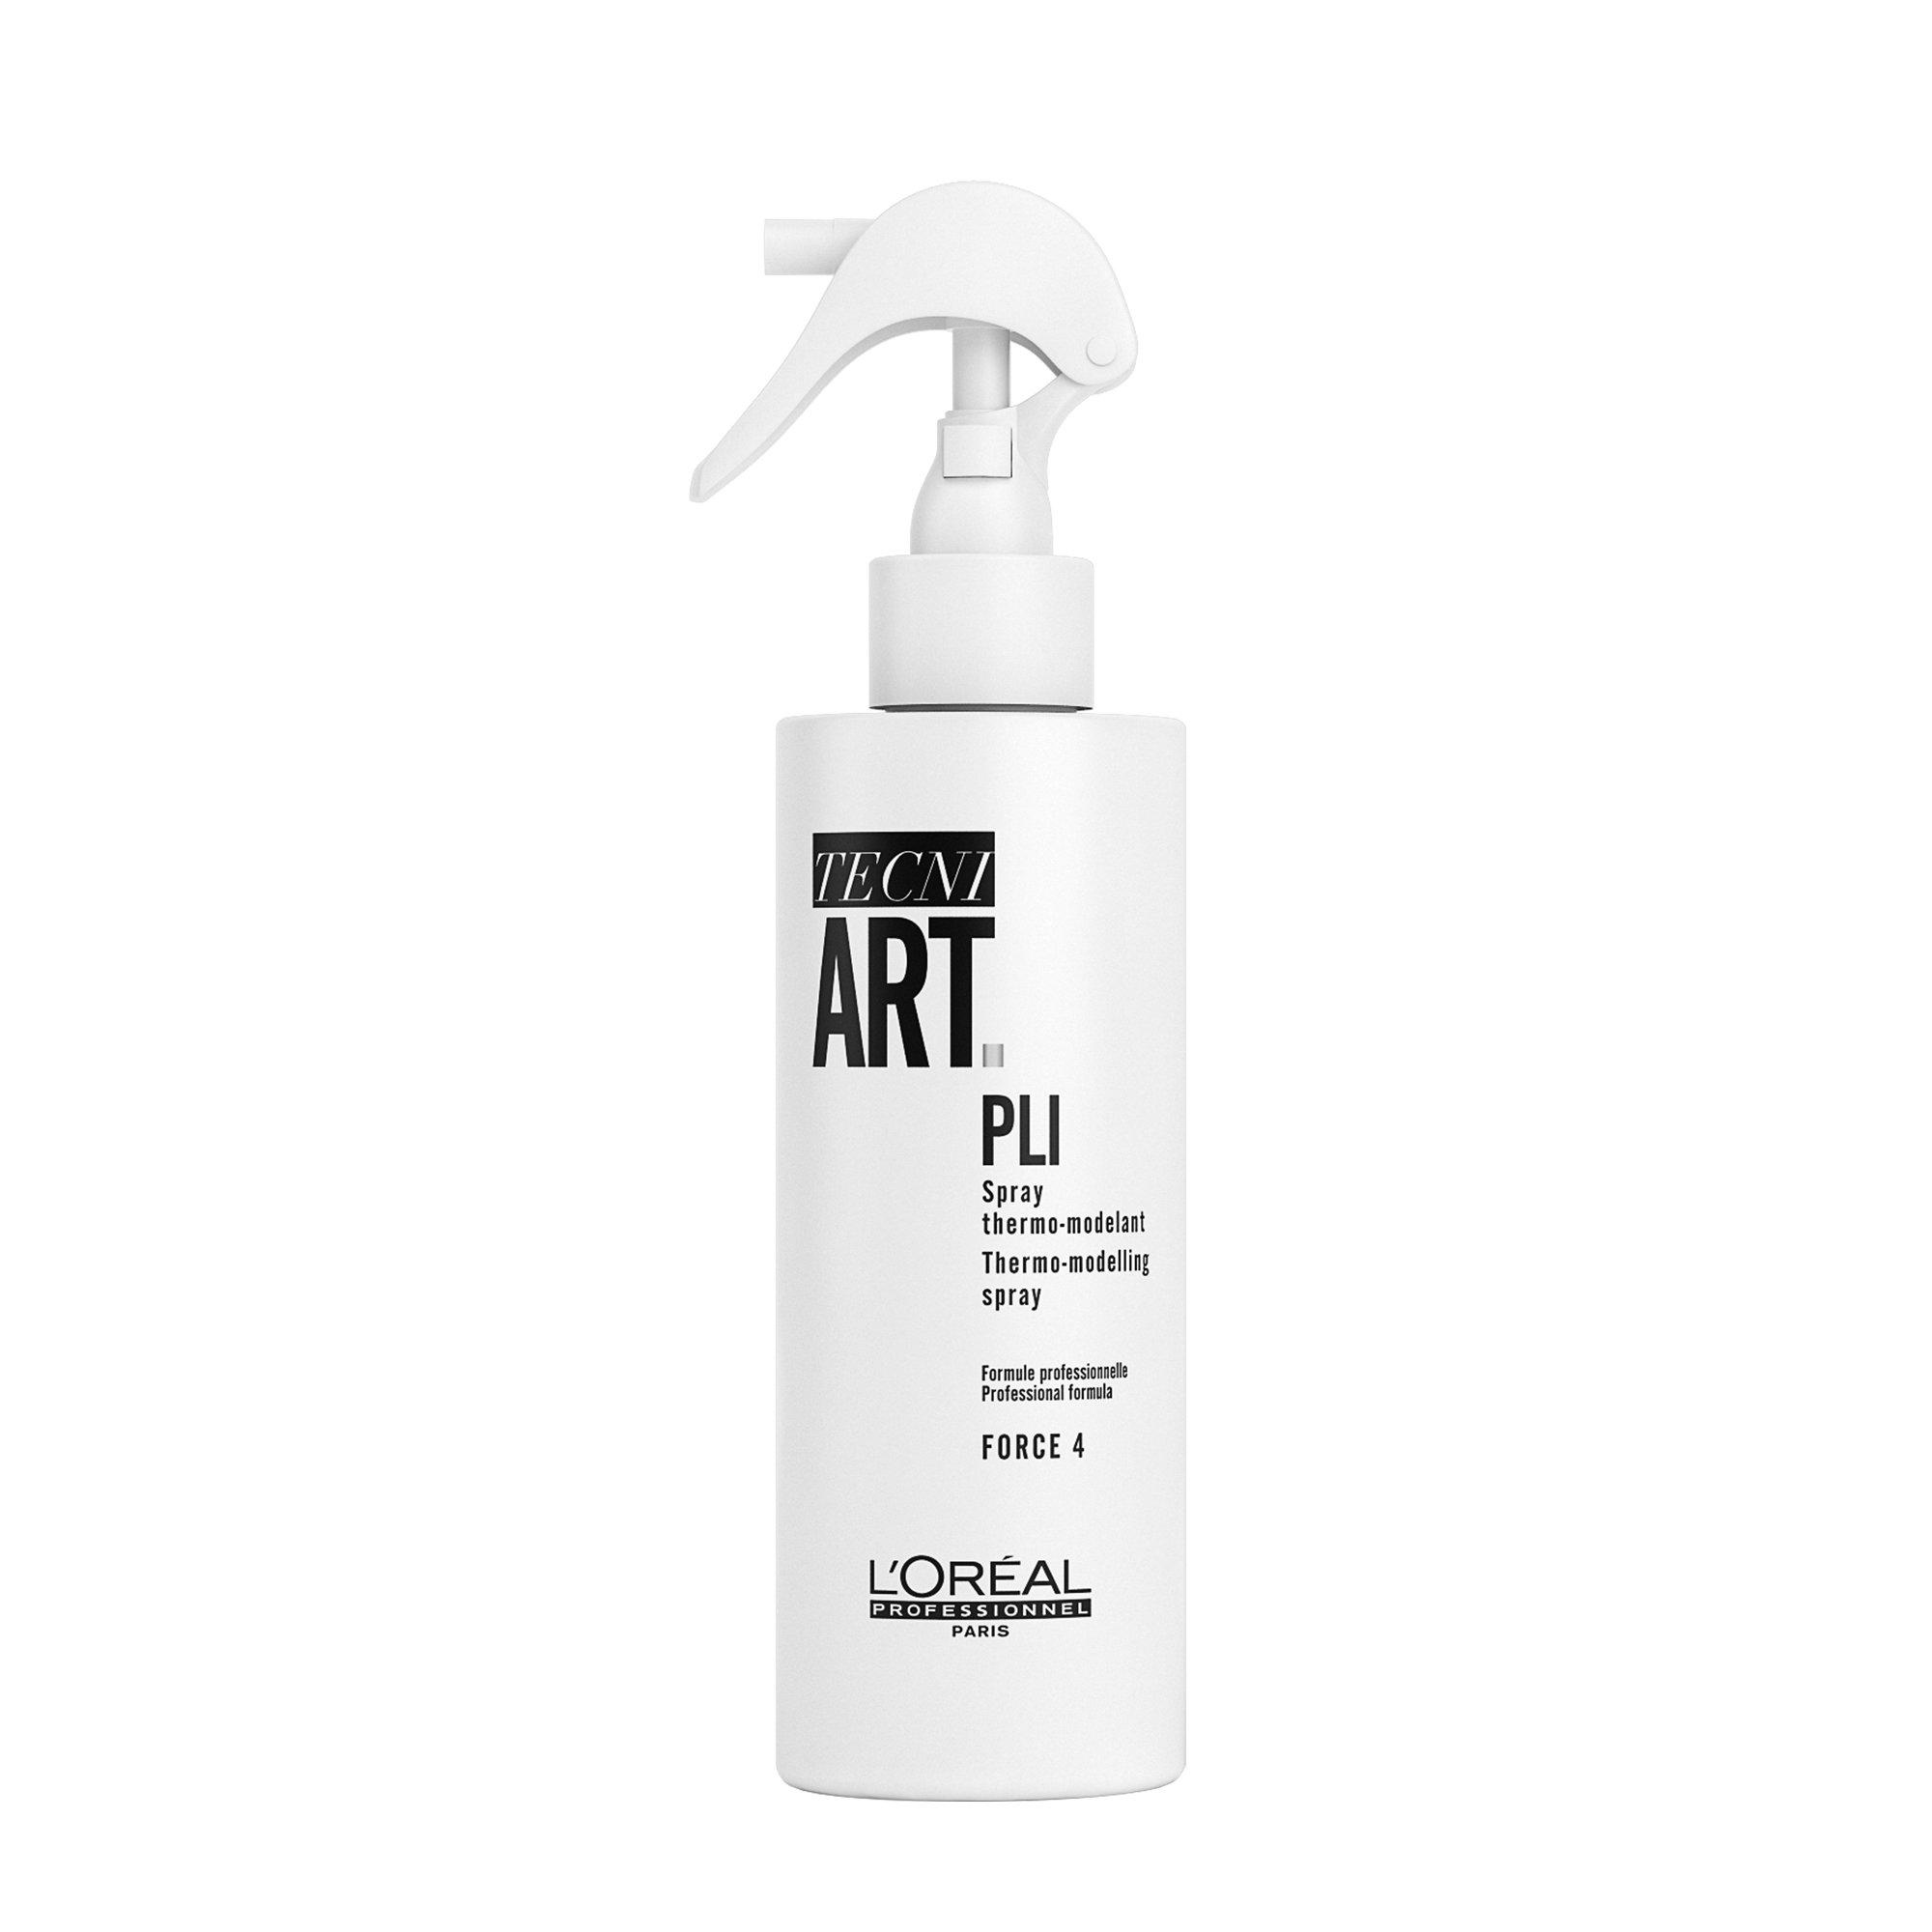 L'Oréal Professionnel - Tecni Art PLI Shaper 190 ml